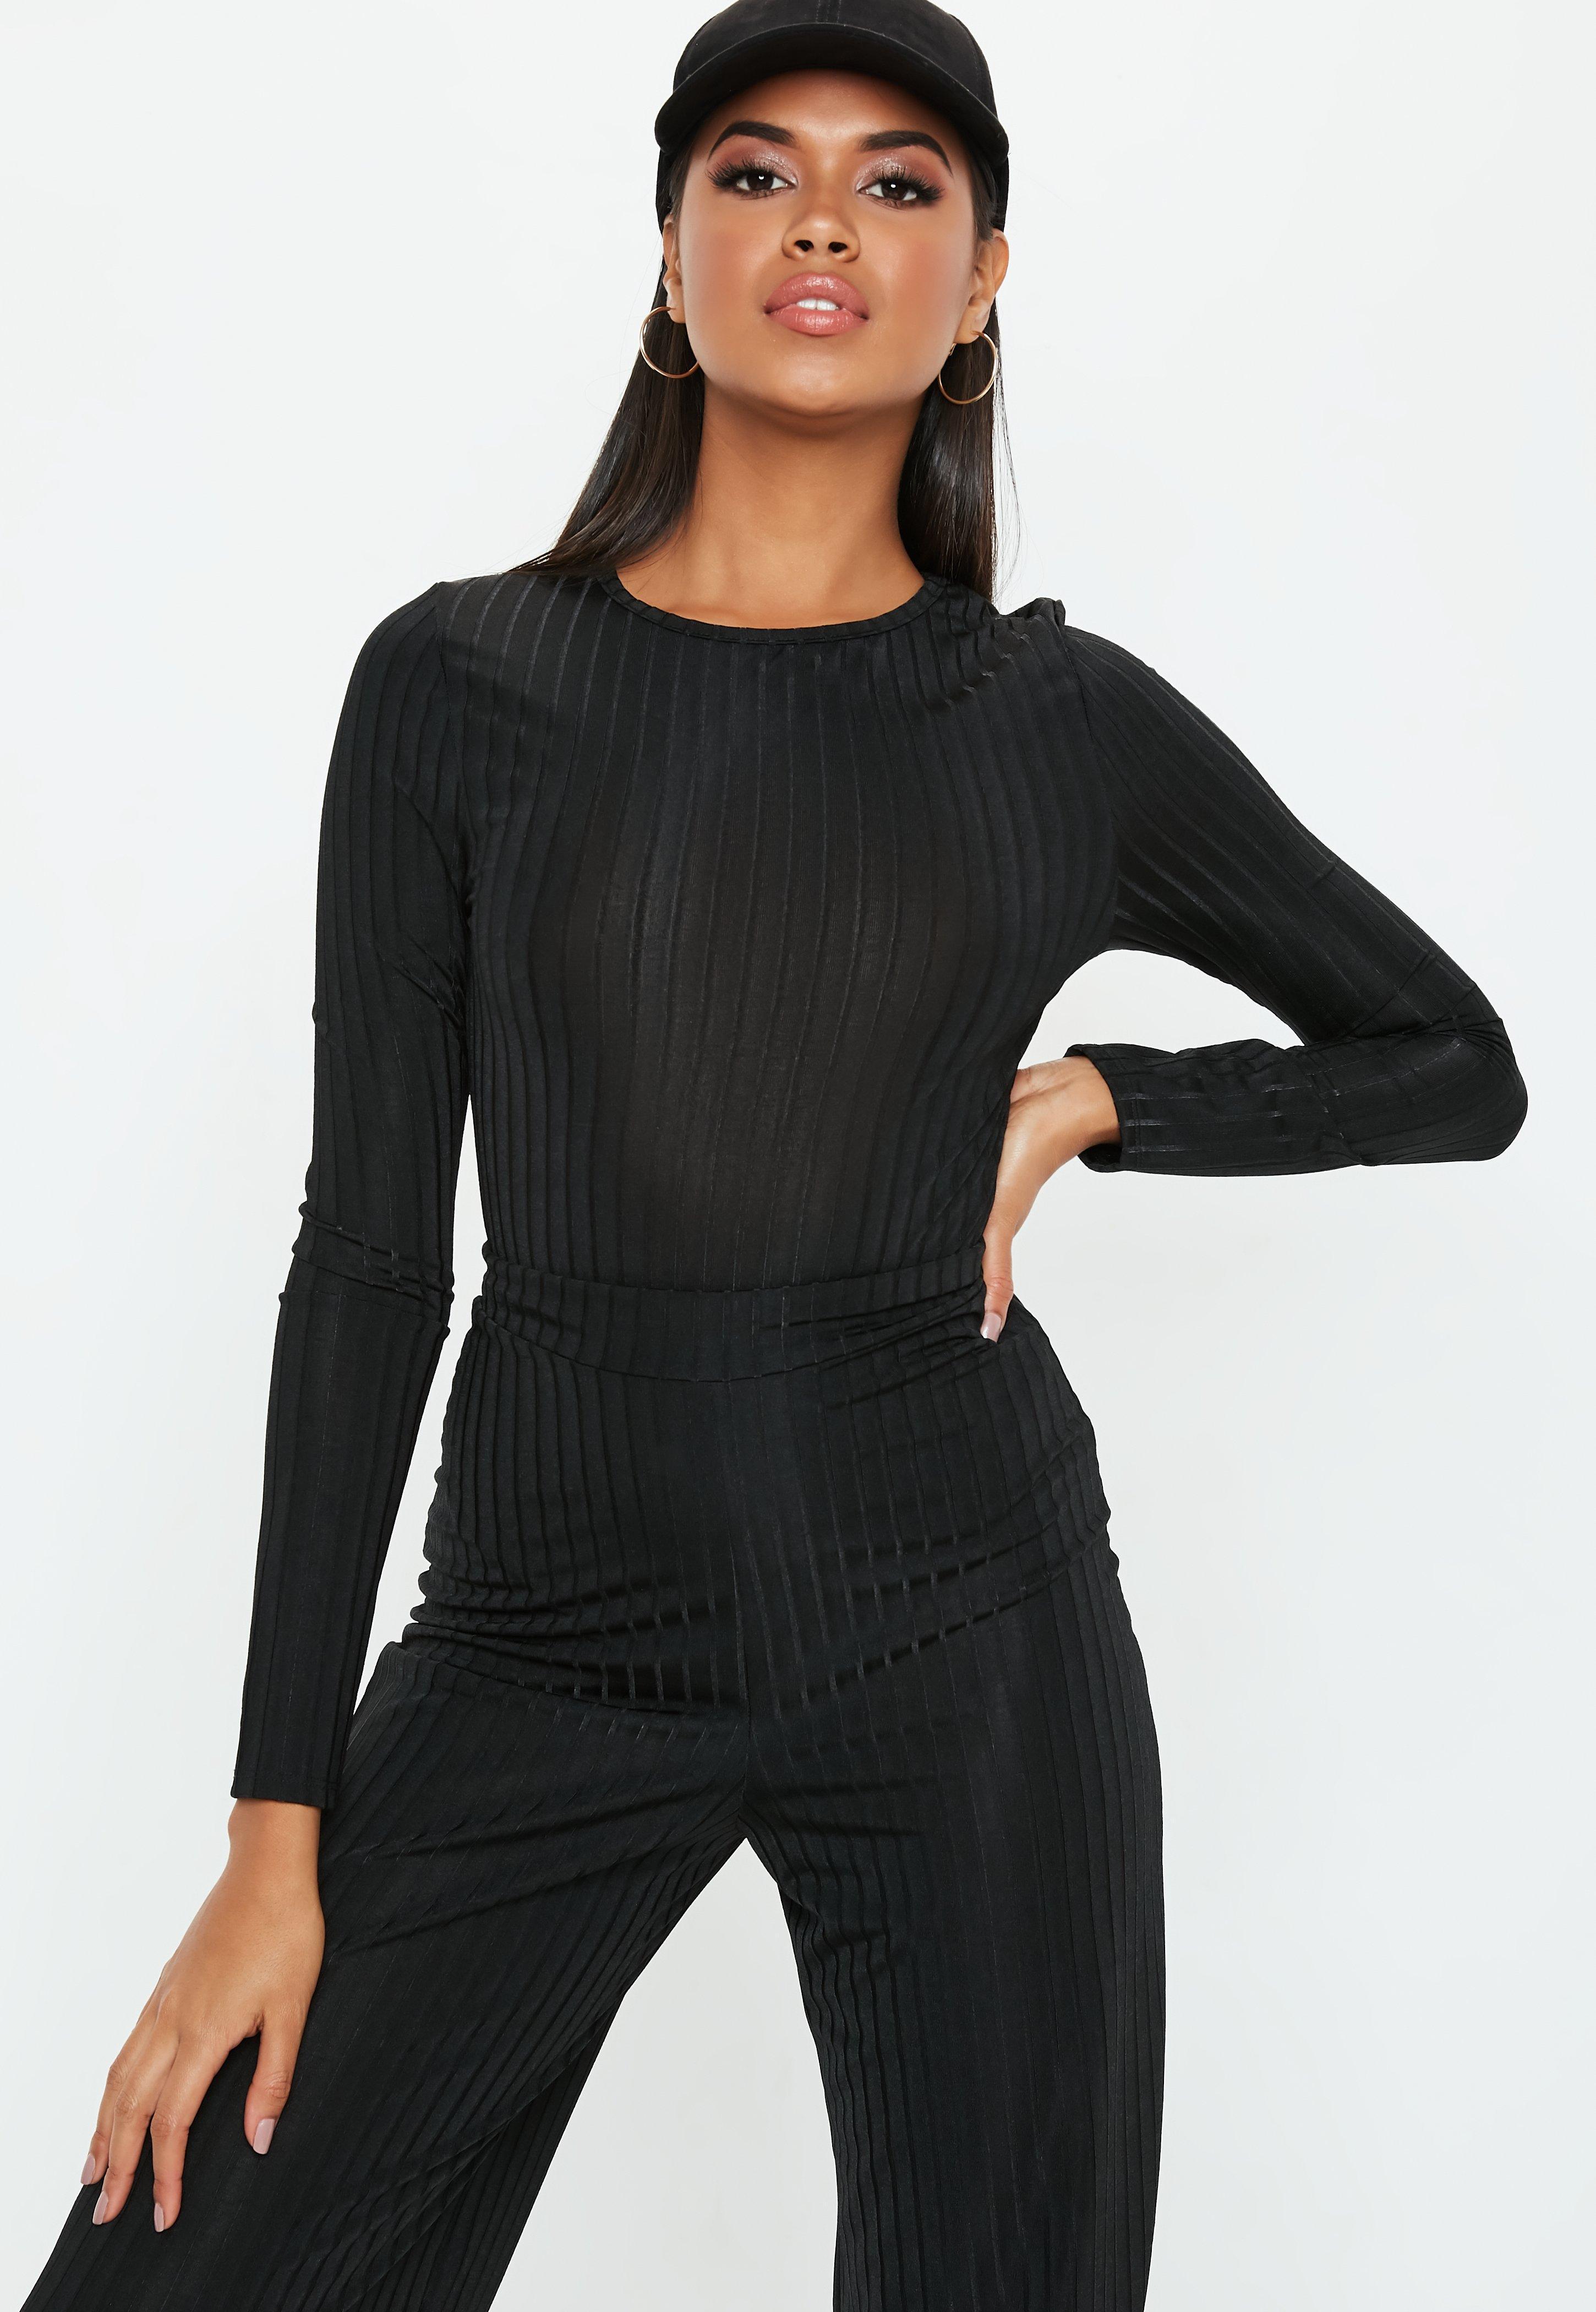 Lyst - Missguided Black Shiny Ribbed Long Sleeve Bodysuit in Black 4d3b9e07c